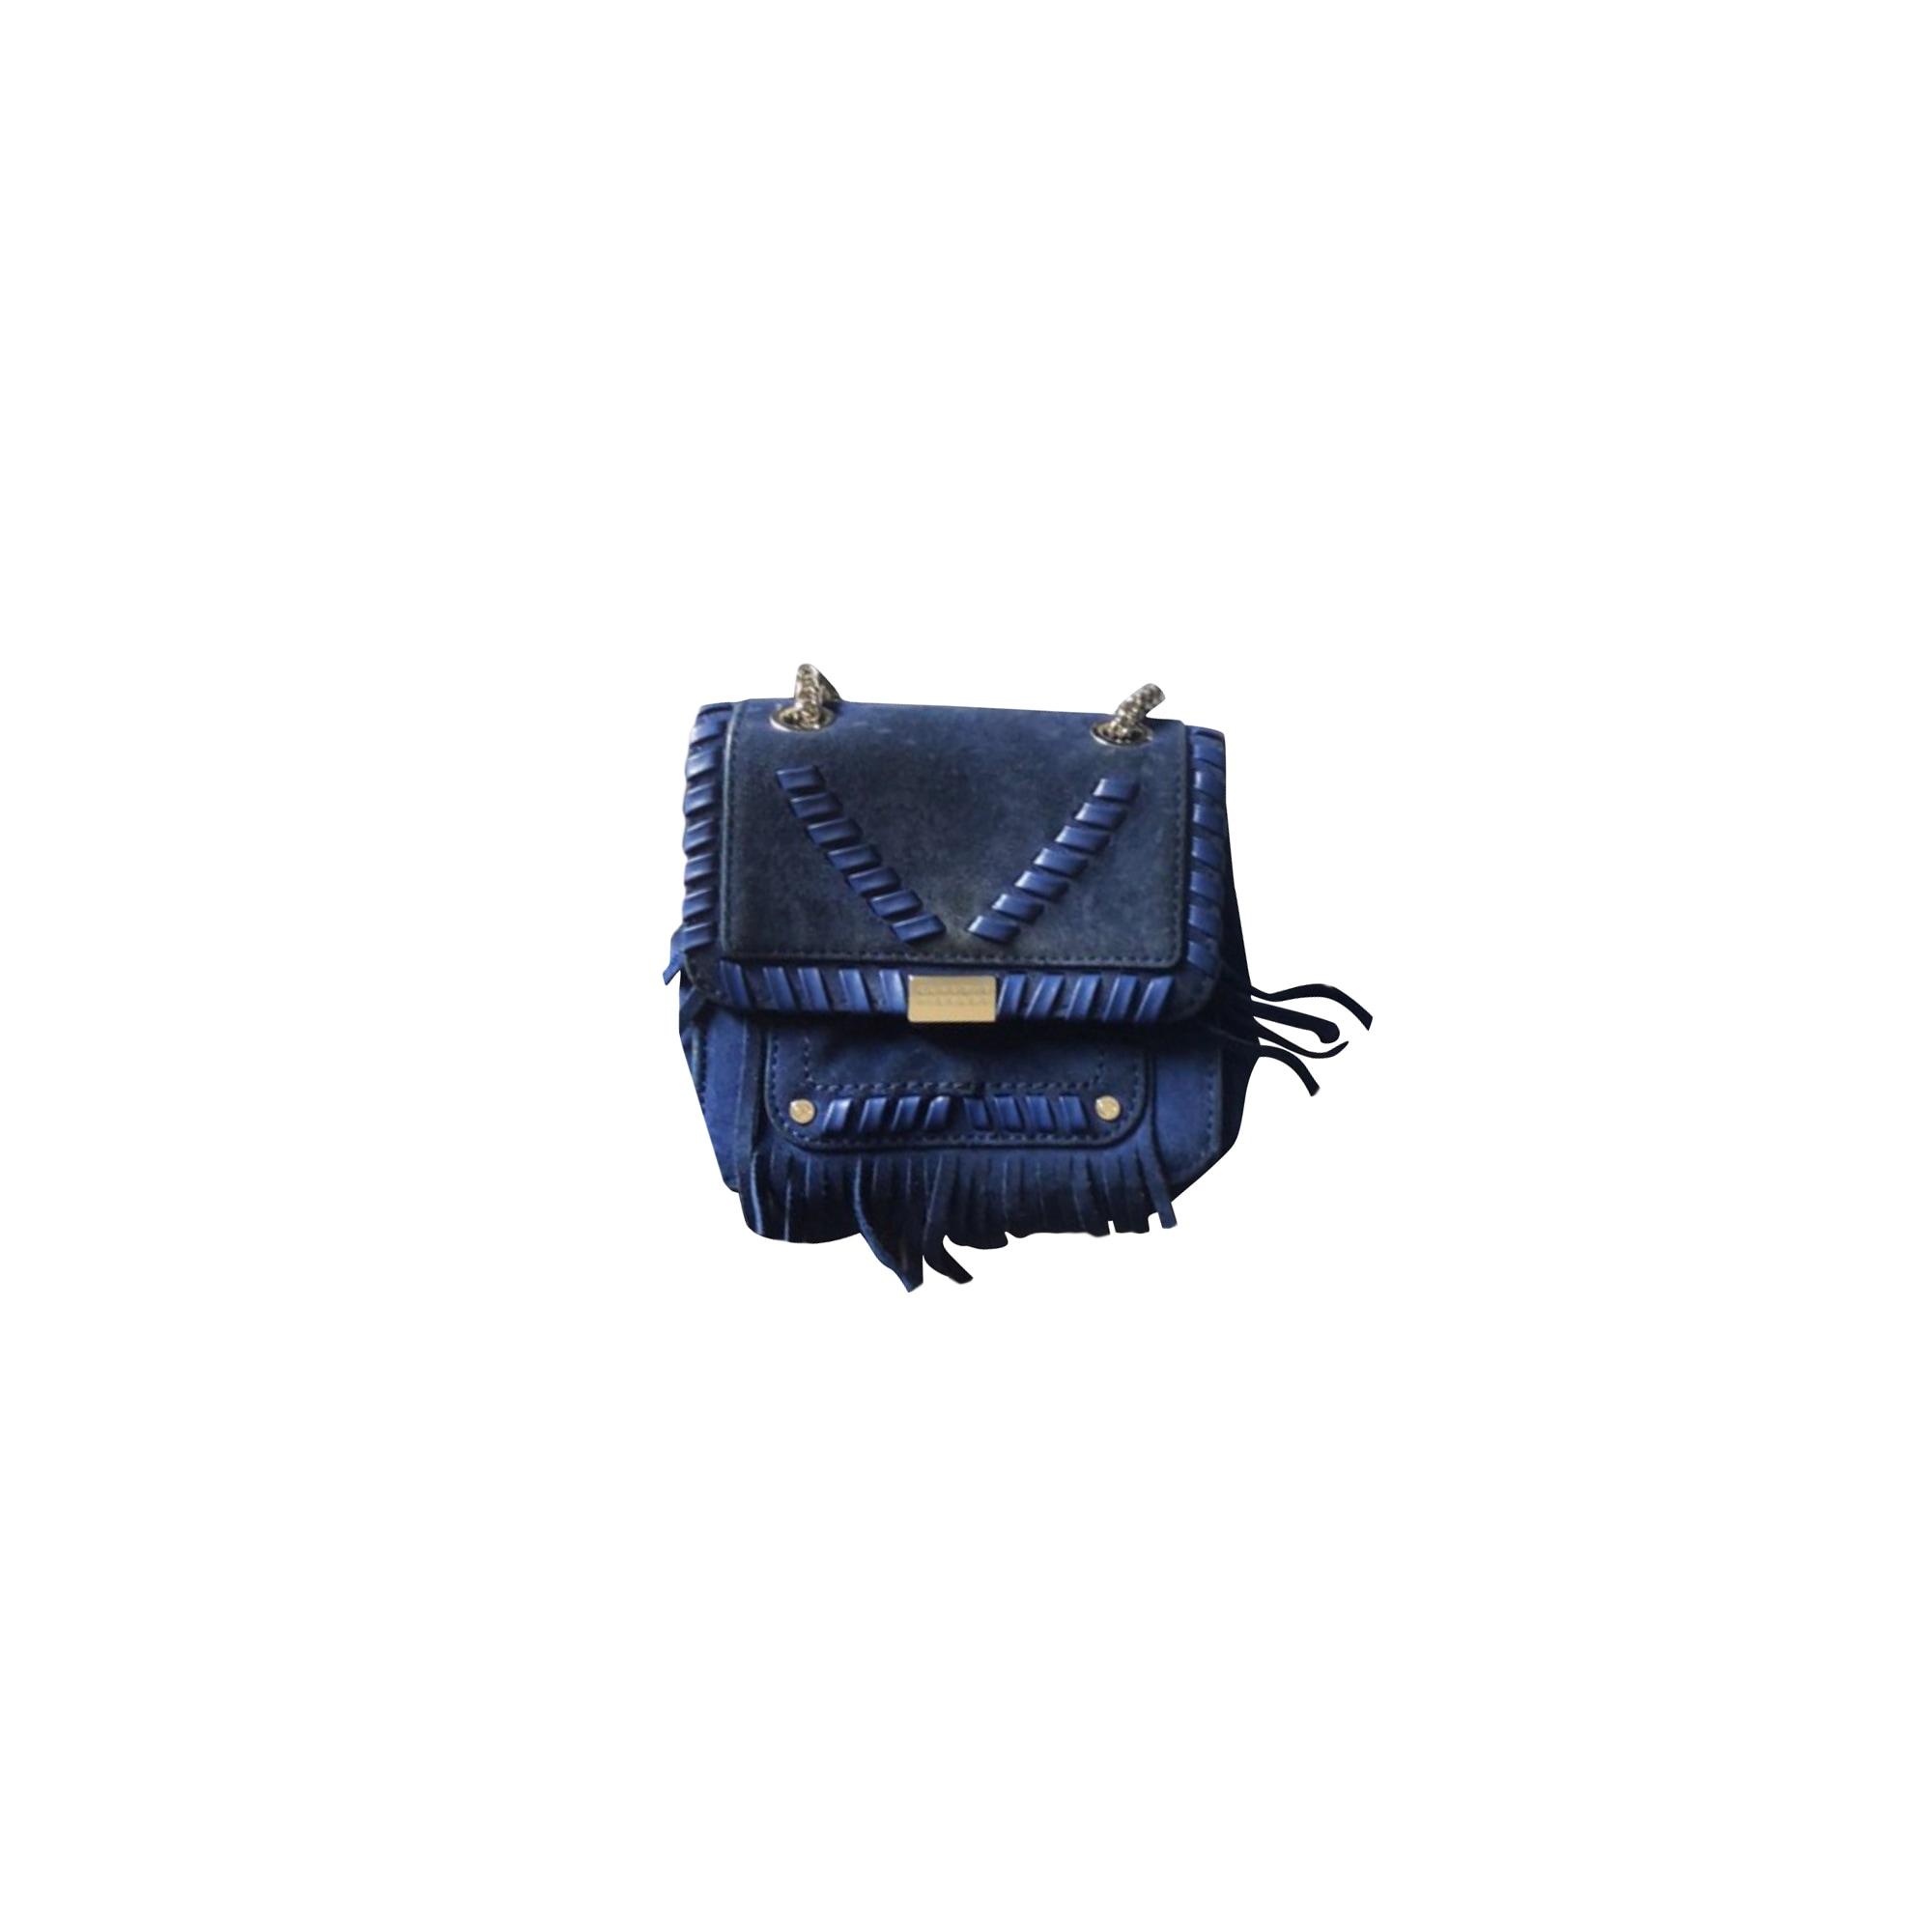 Leather Shoulder Bag CLAUDIE PIERLOT Blue, navy, turquoise